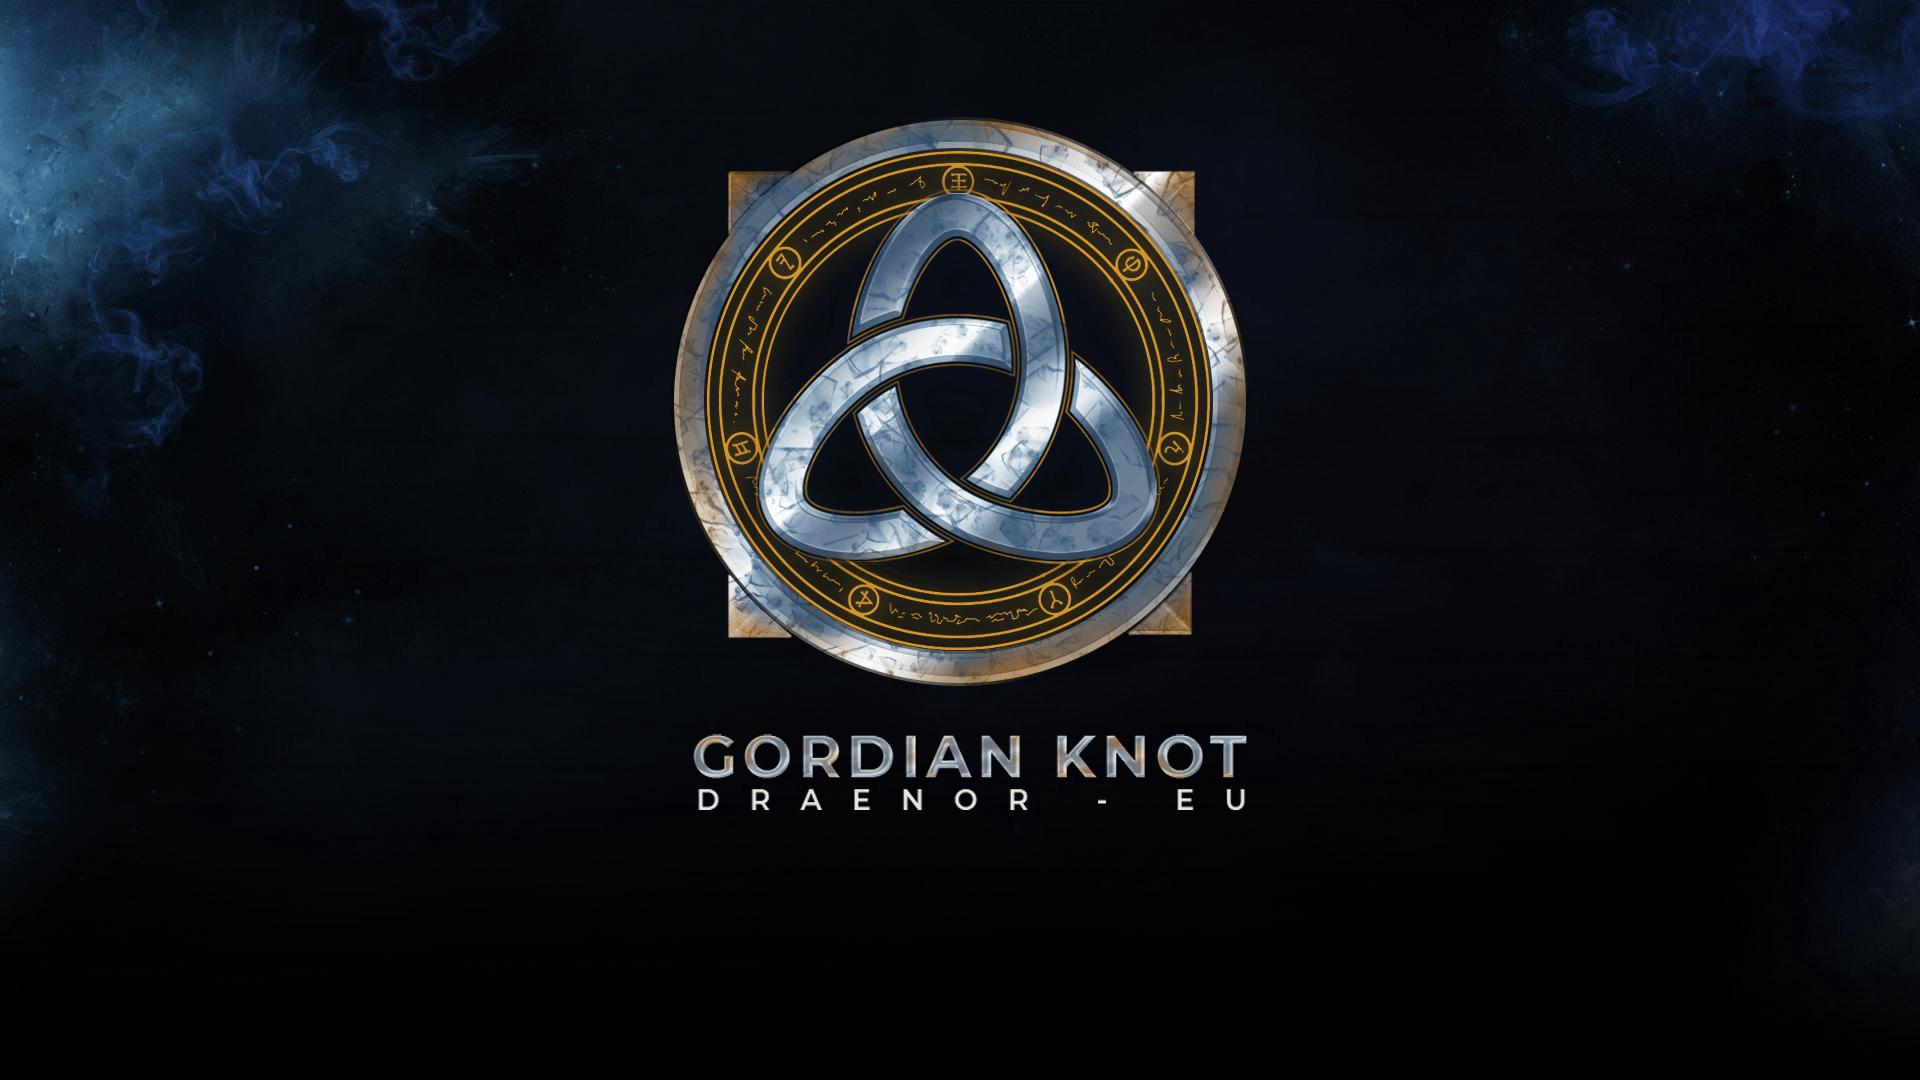 Gordian Knot - Draenor EU - Horde - World of Warcraft Guild WoW